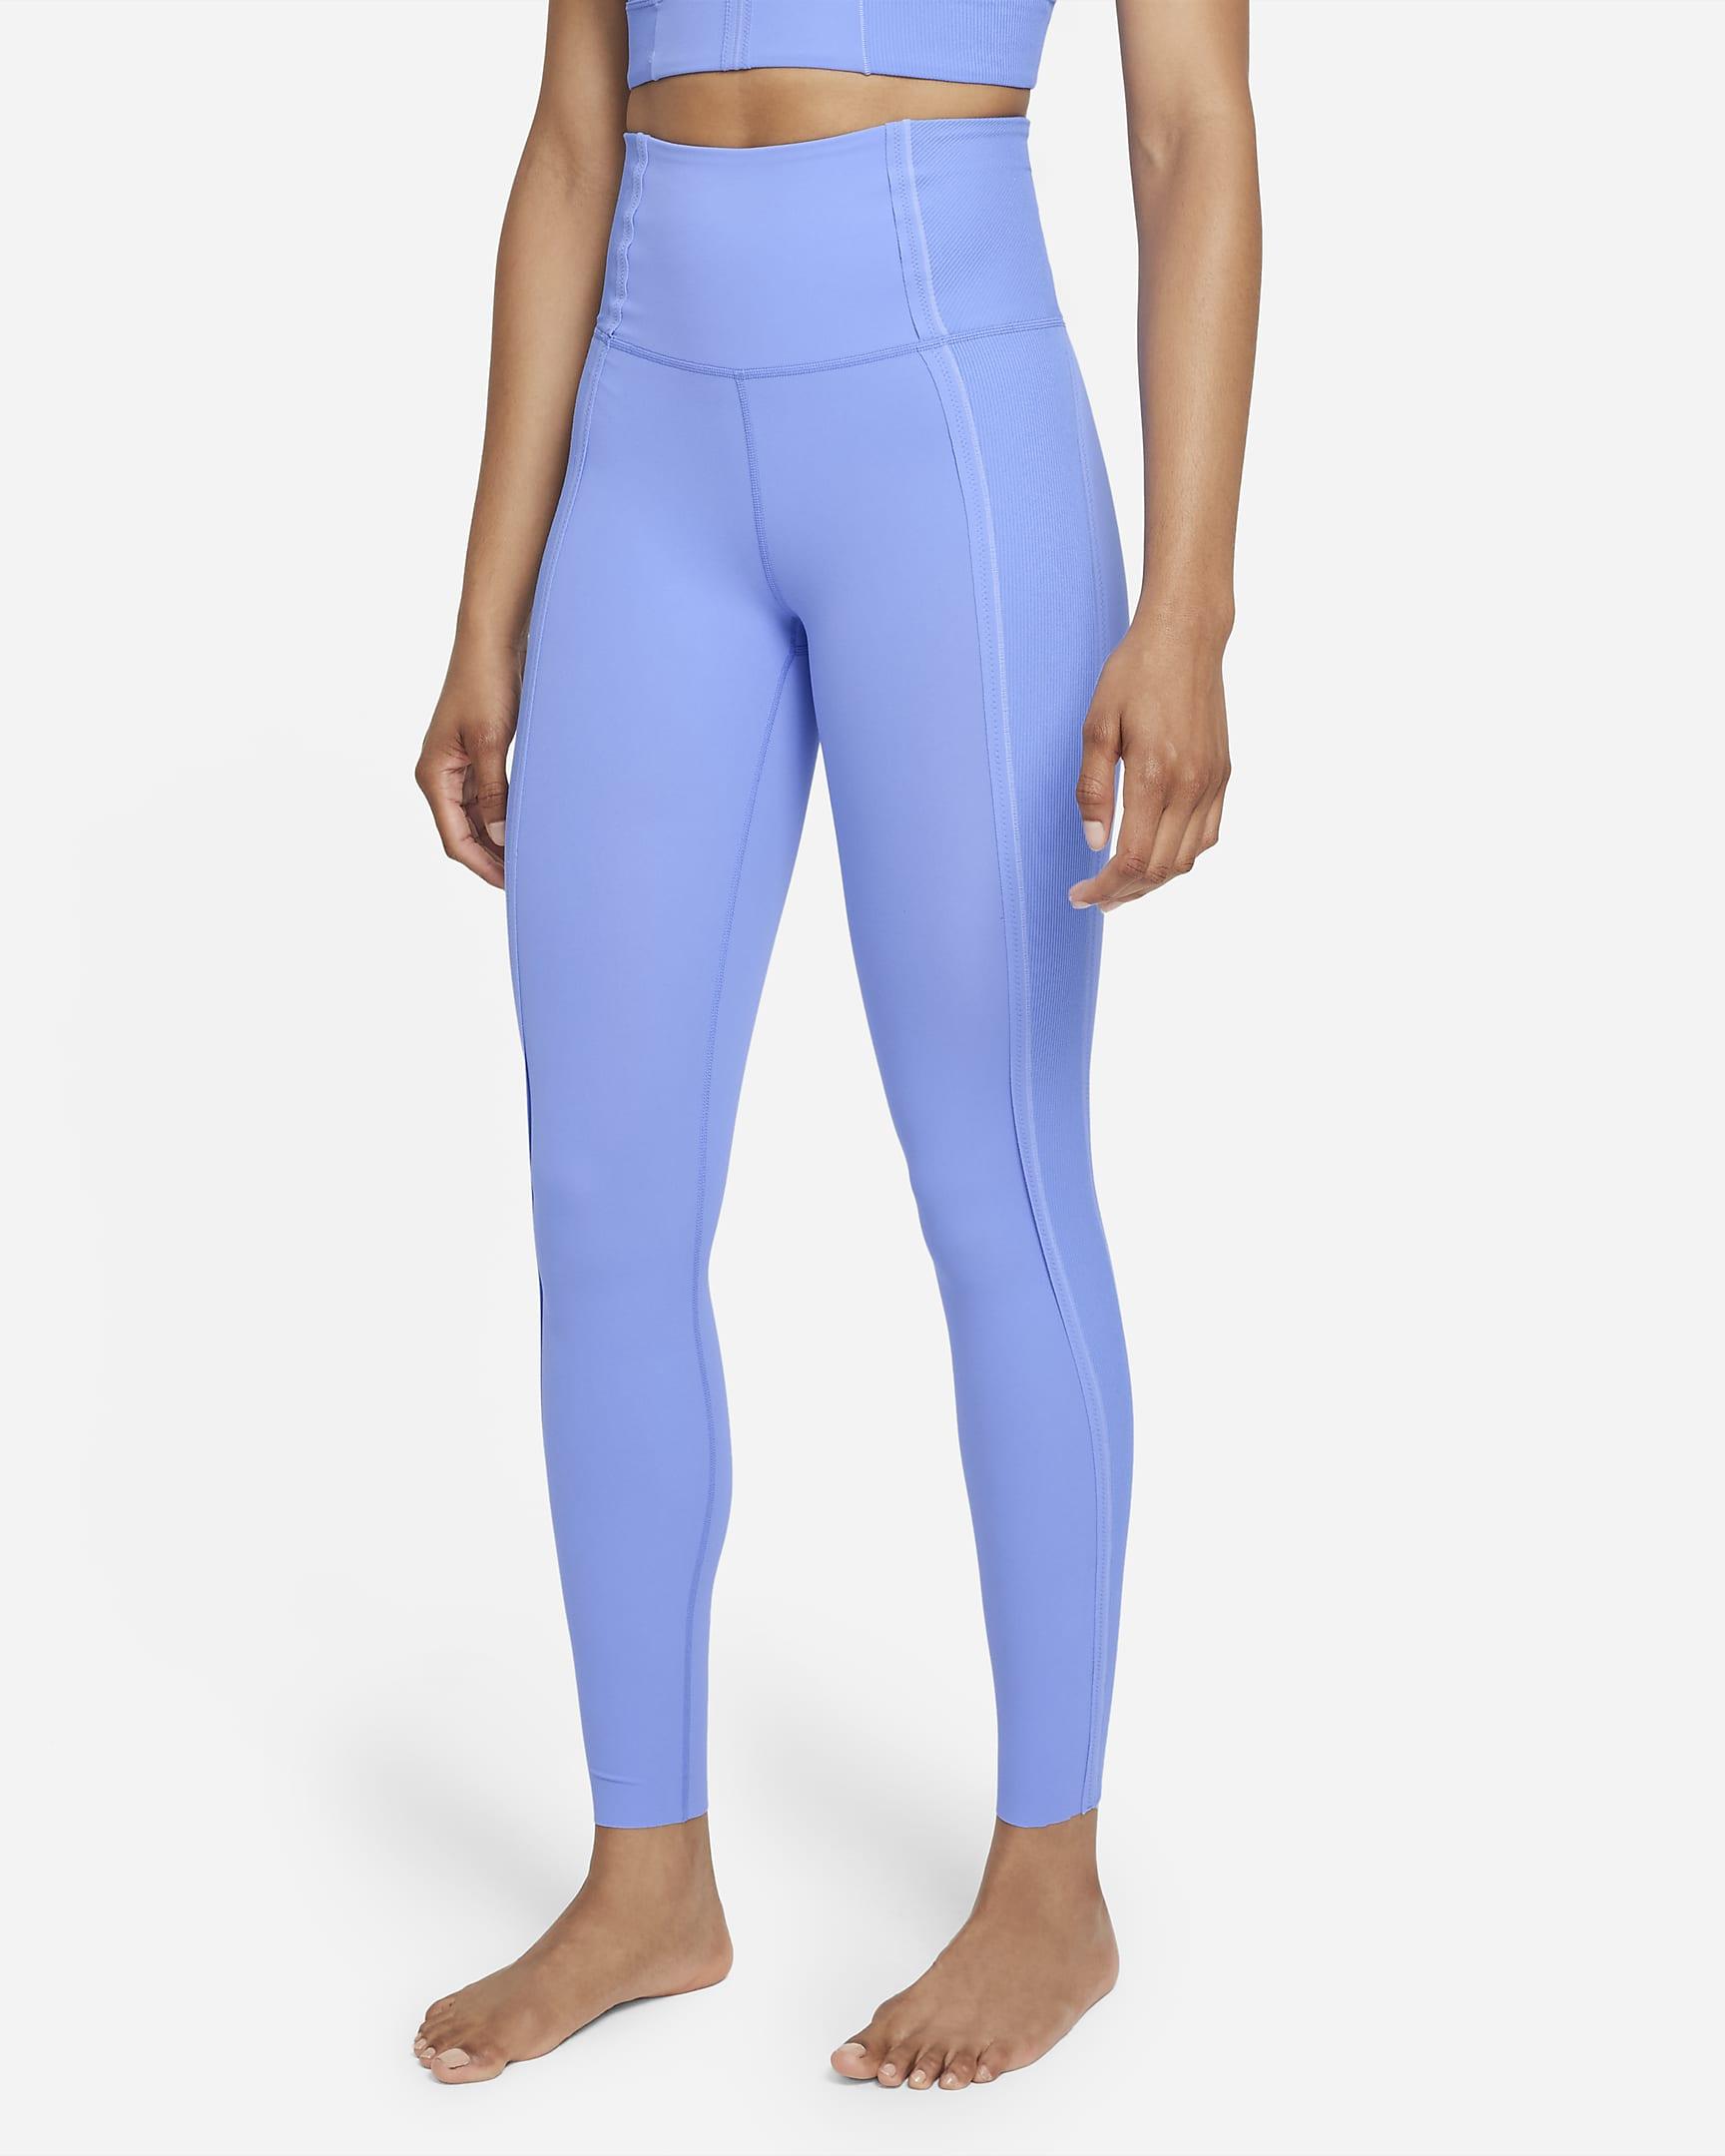 blue leggings nike yoga